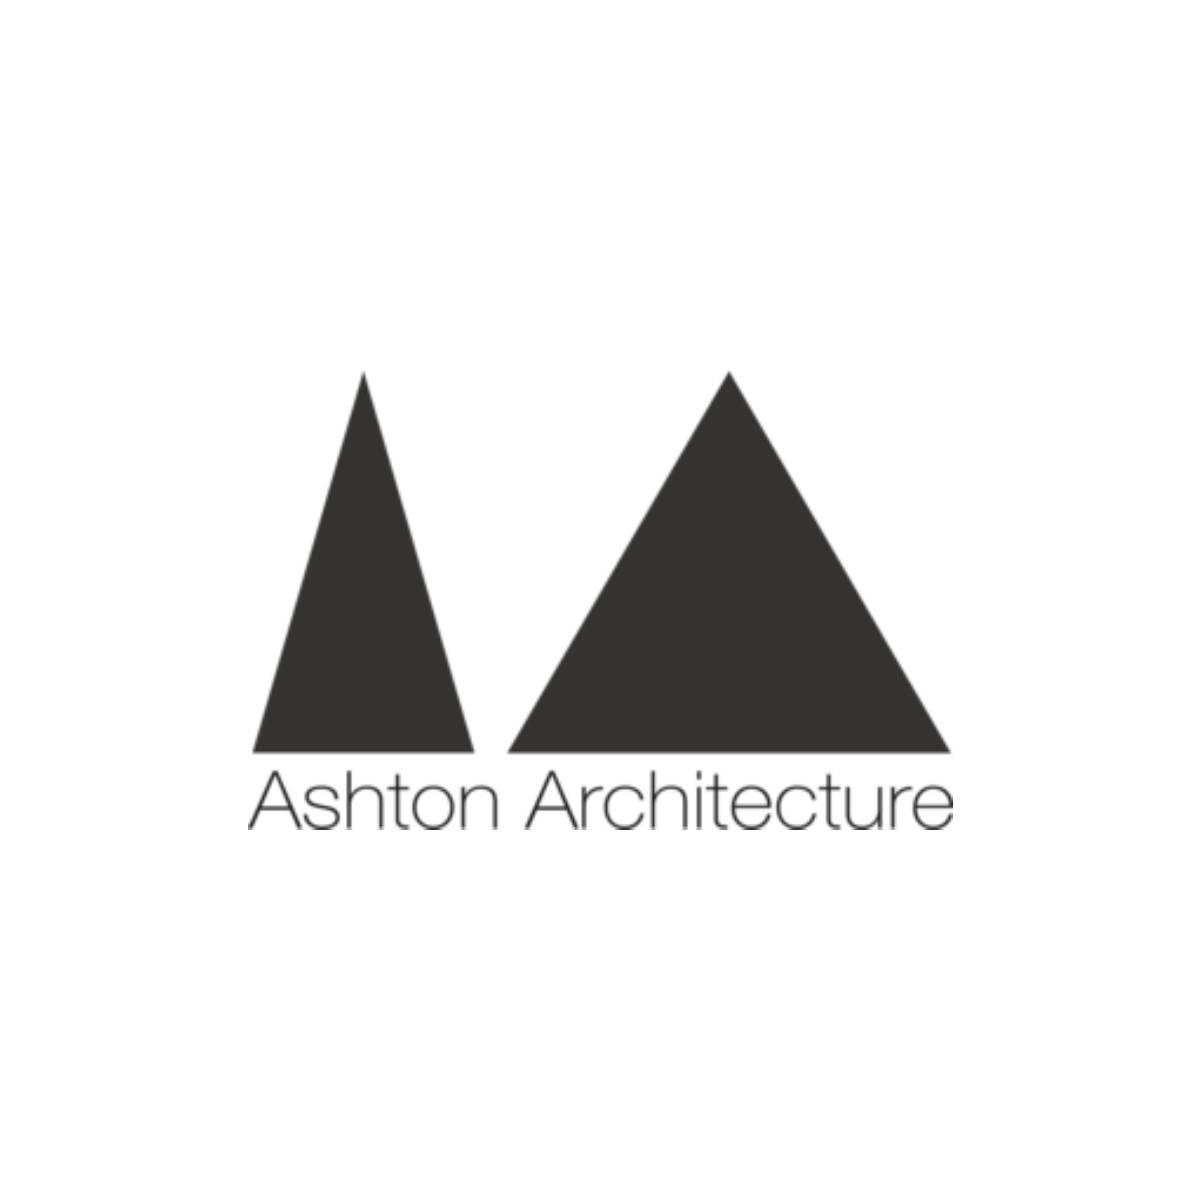 Ashton Architecture.jpg